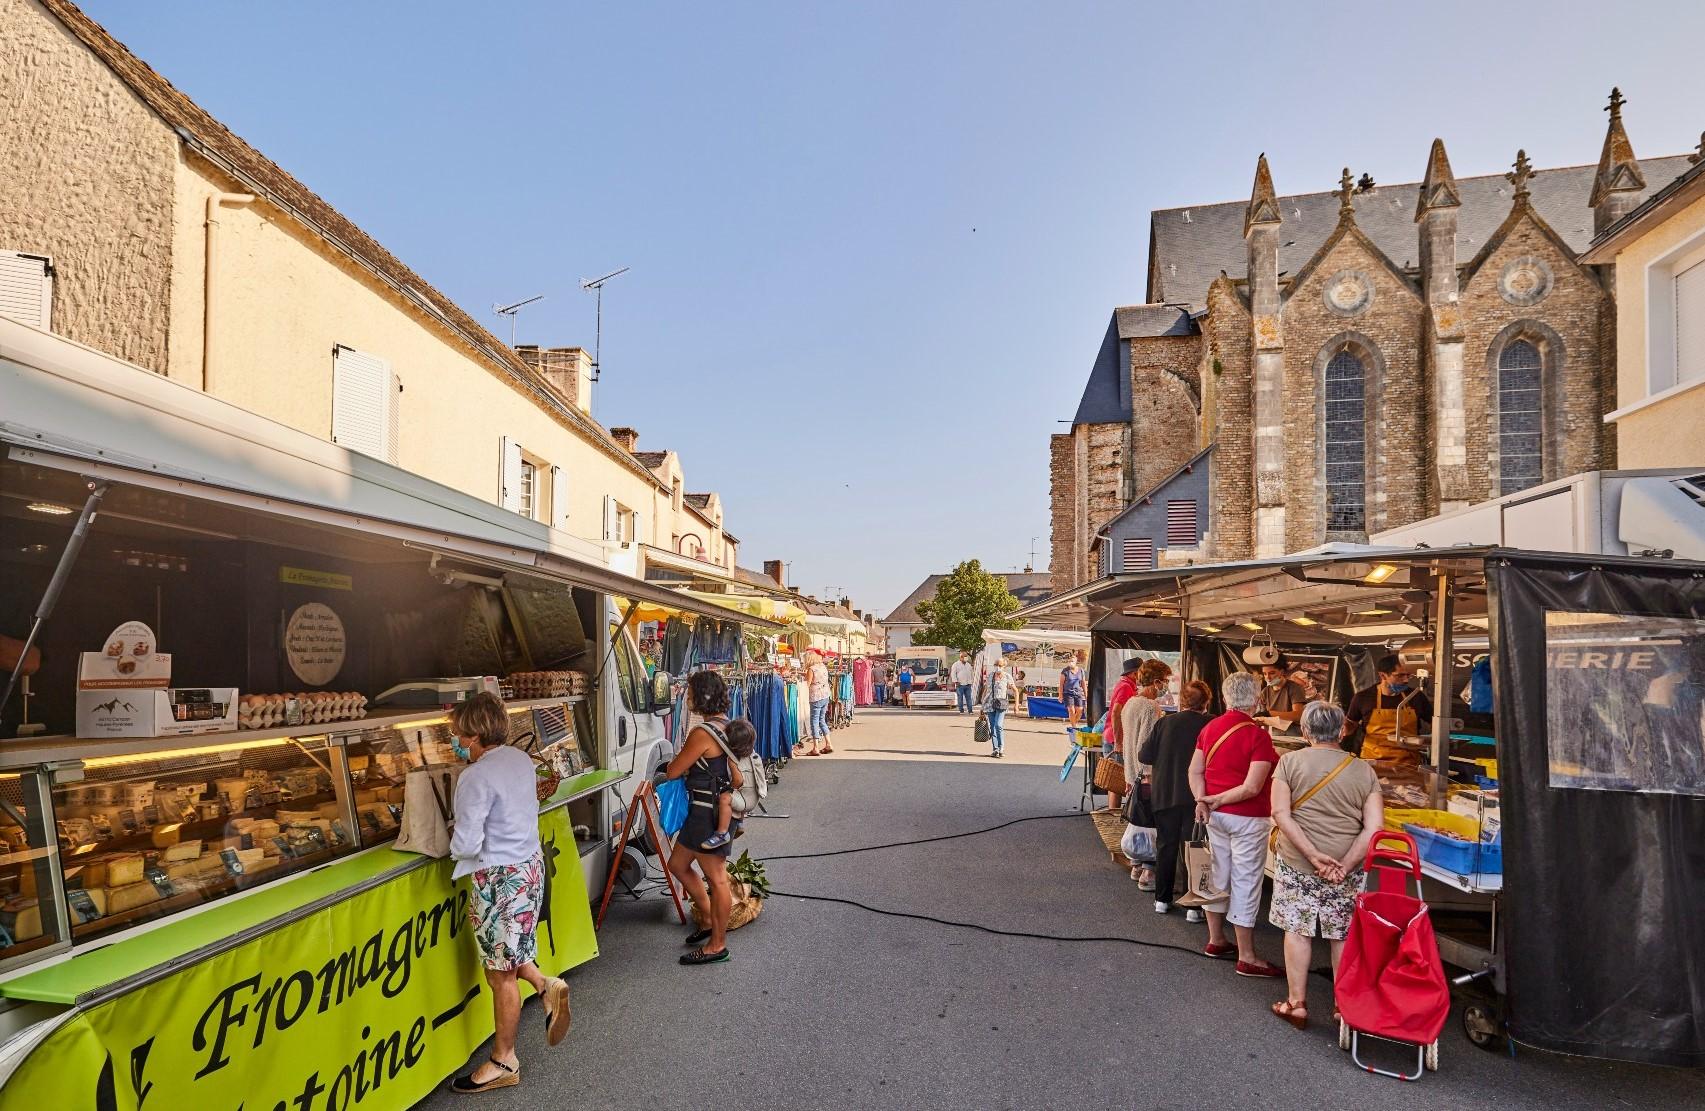 Herbignac market - © Alexandre Lamoureux